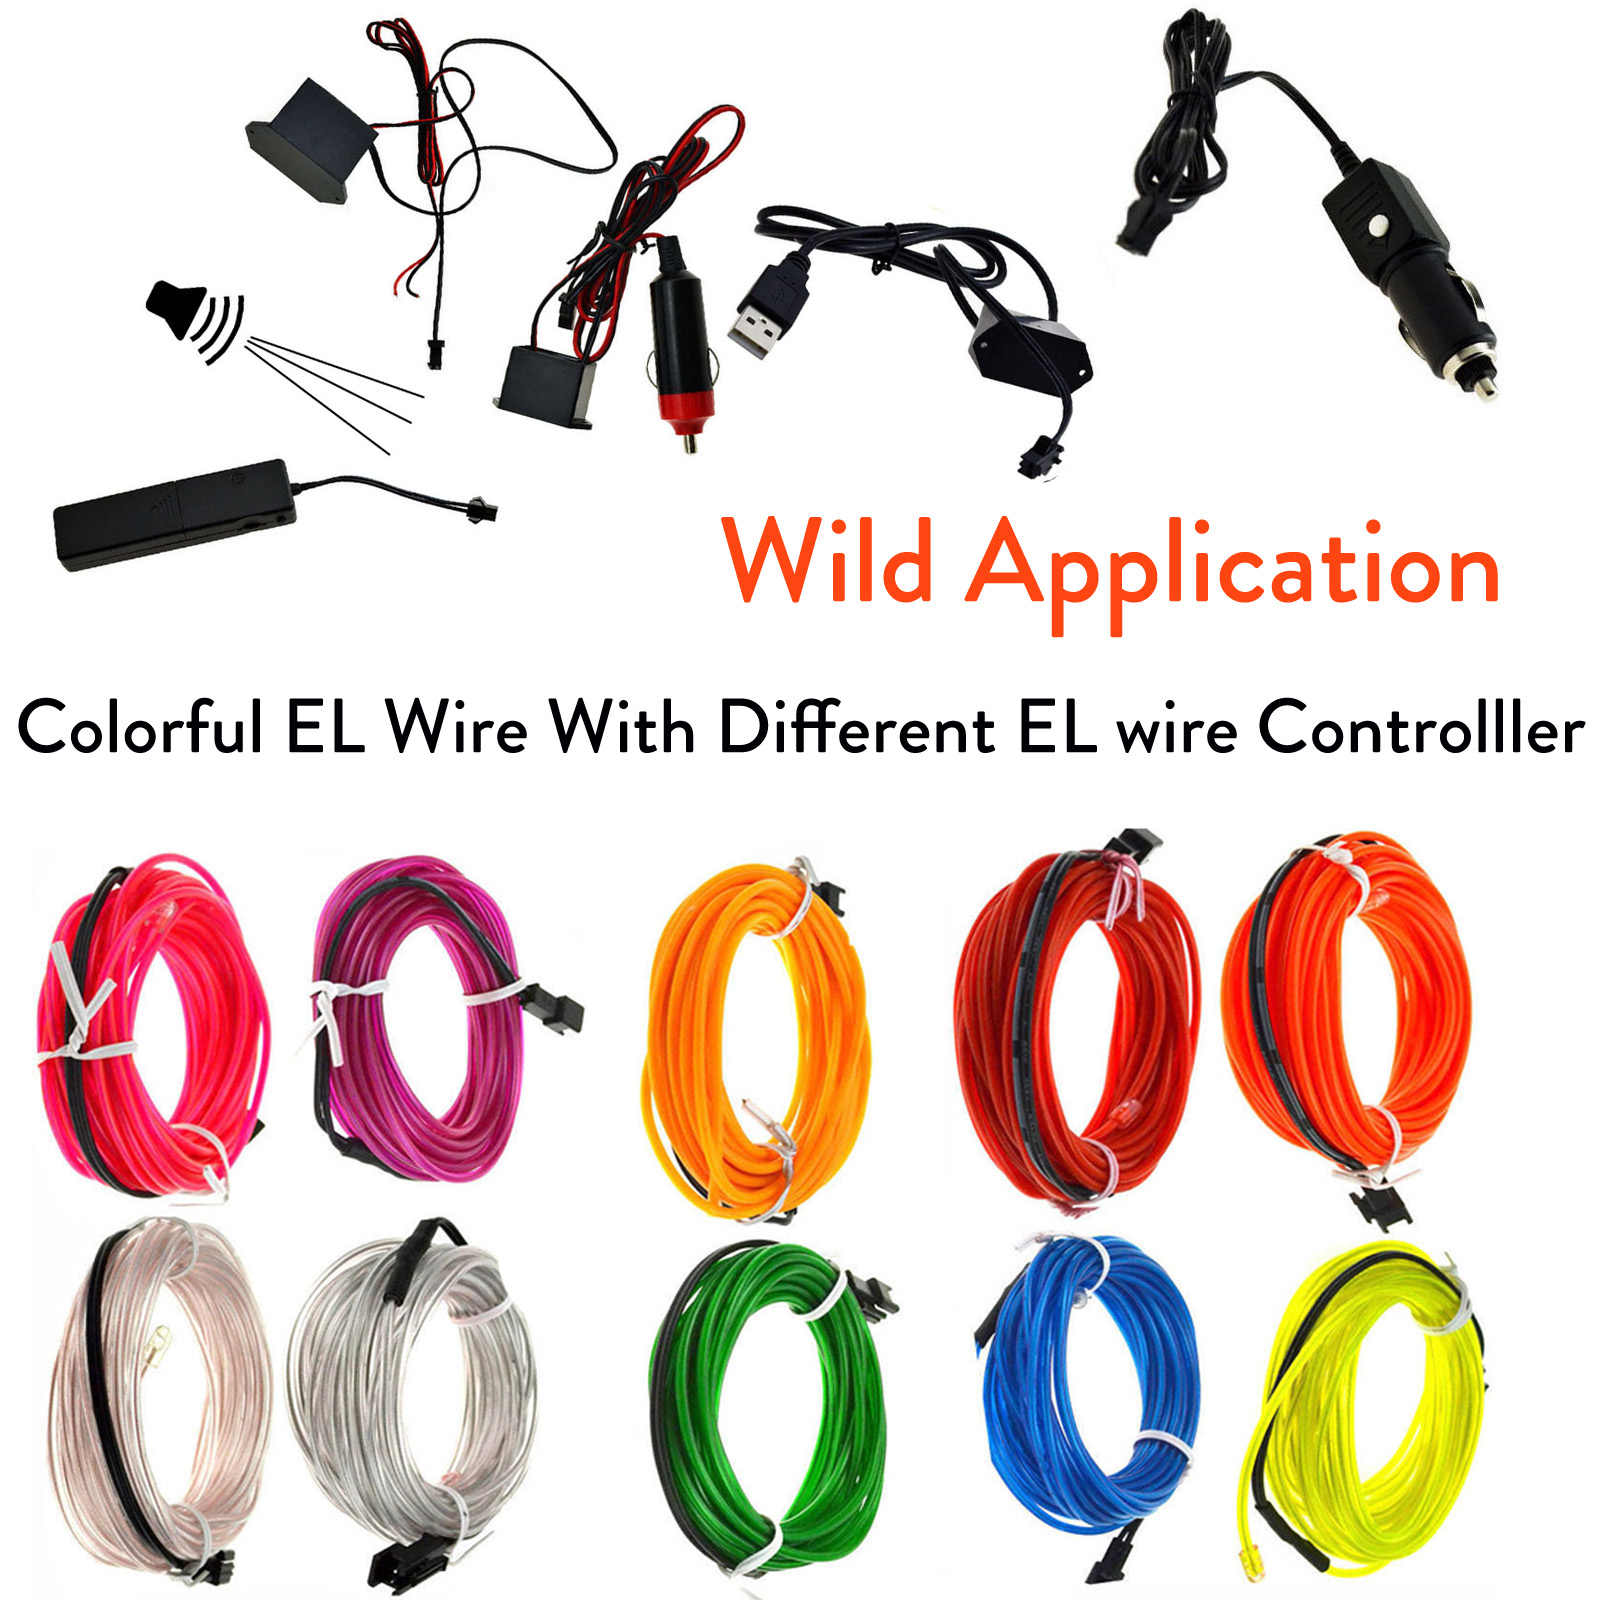 El Kawat 1M Cahaya String Strip LED dengan Controller Inverter 3 V/12 V/Suara diaktifkan/USB/Mobil Rokok